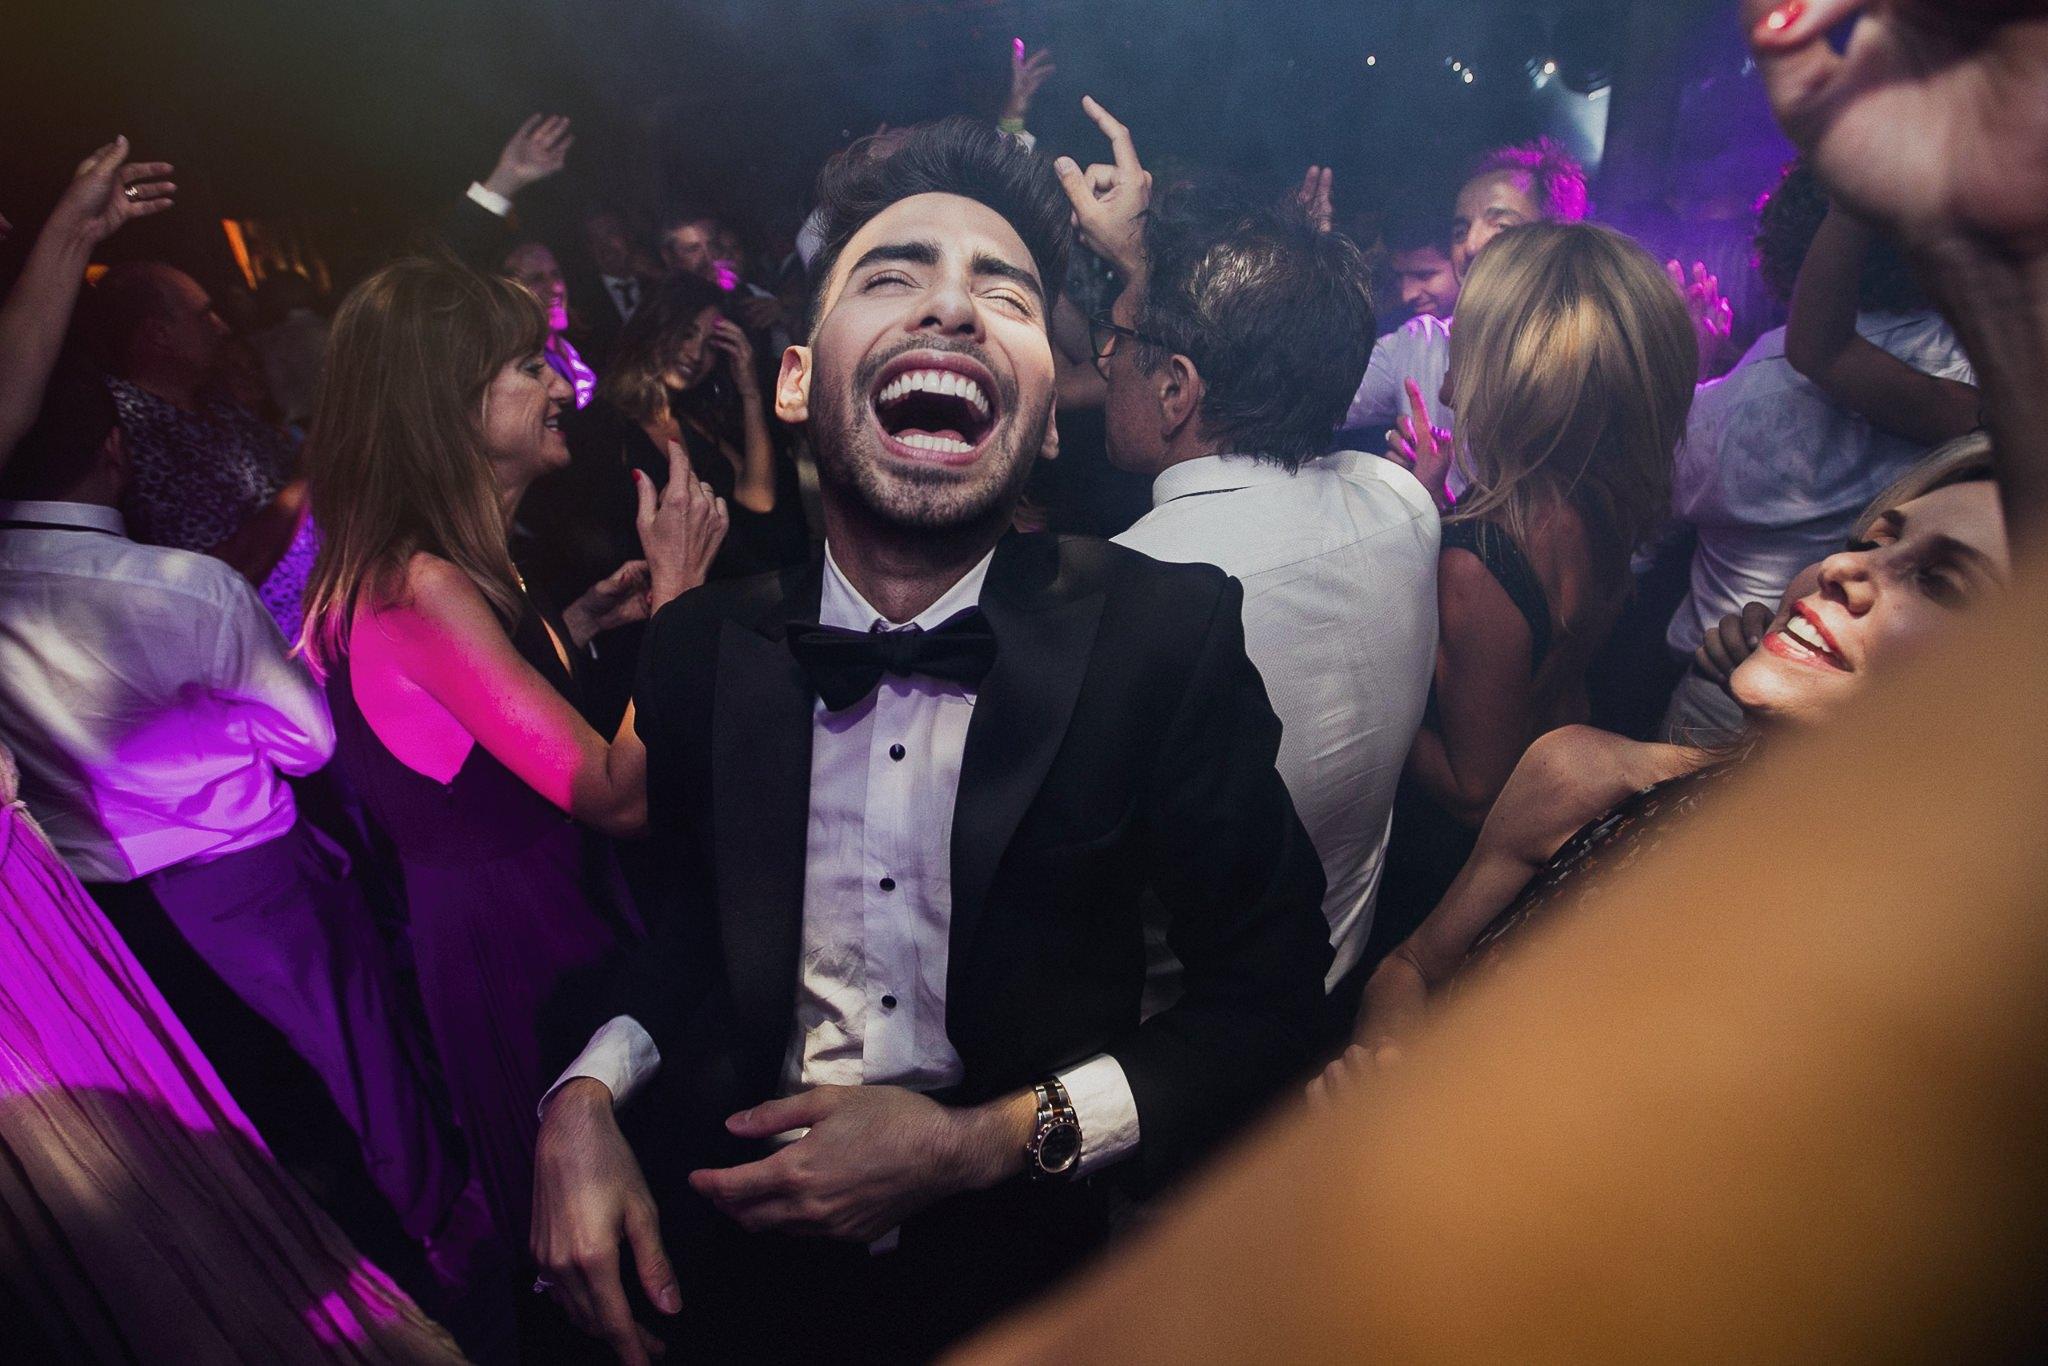 fiesta-en-jose-ignacio, boda-argentina